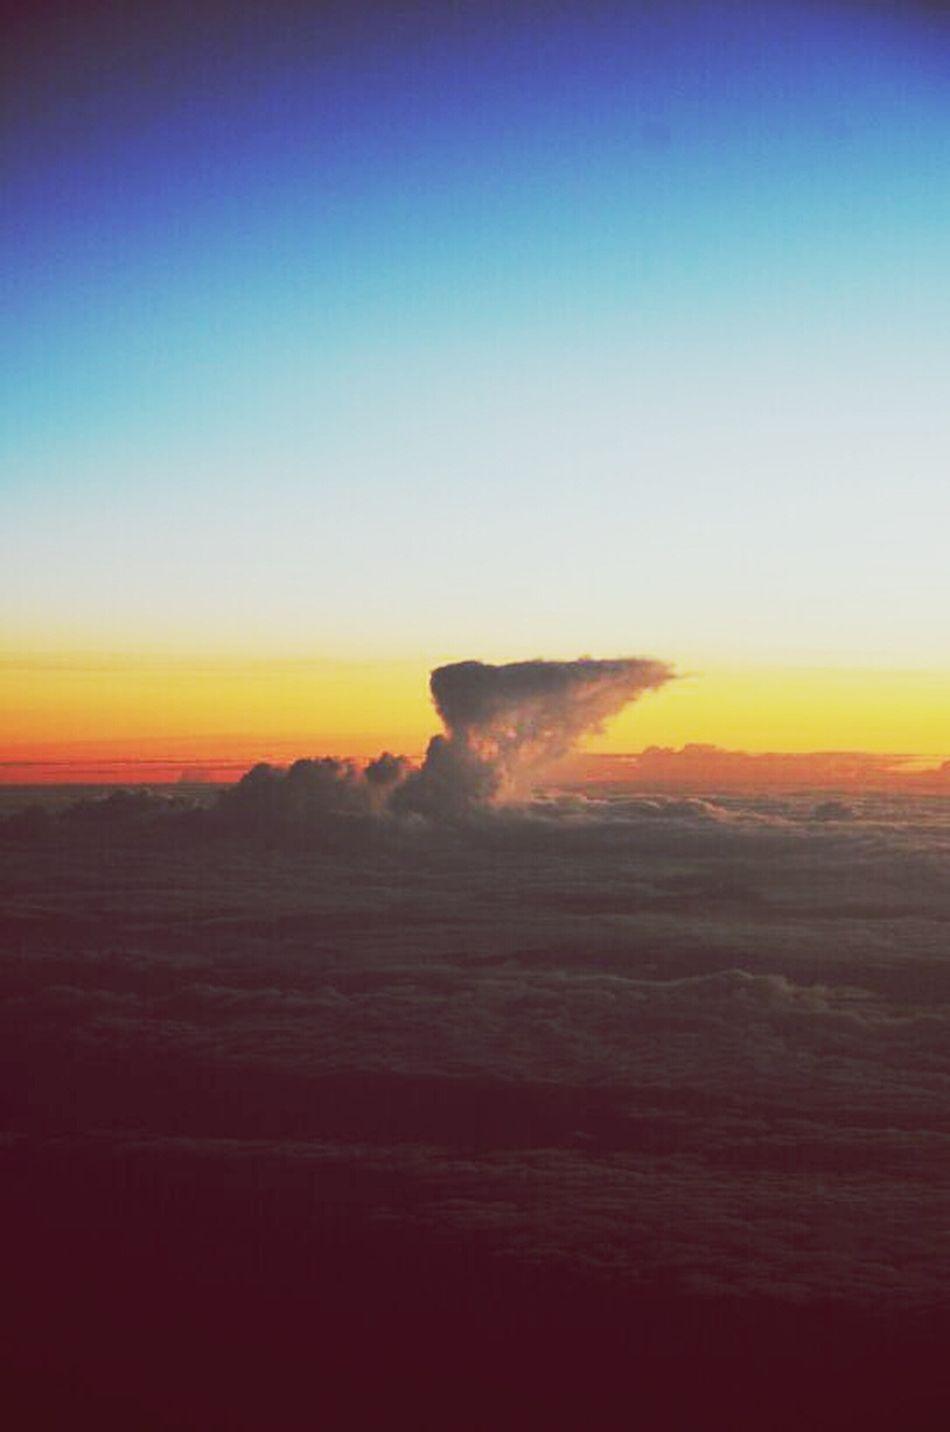 Sky Airplane